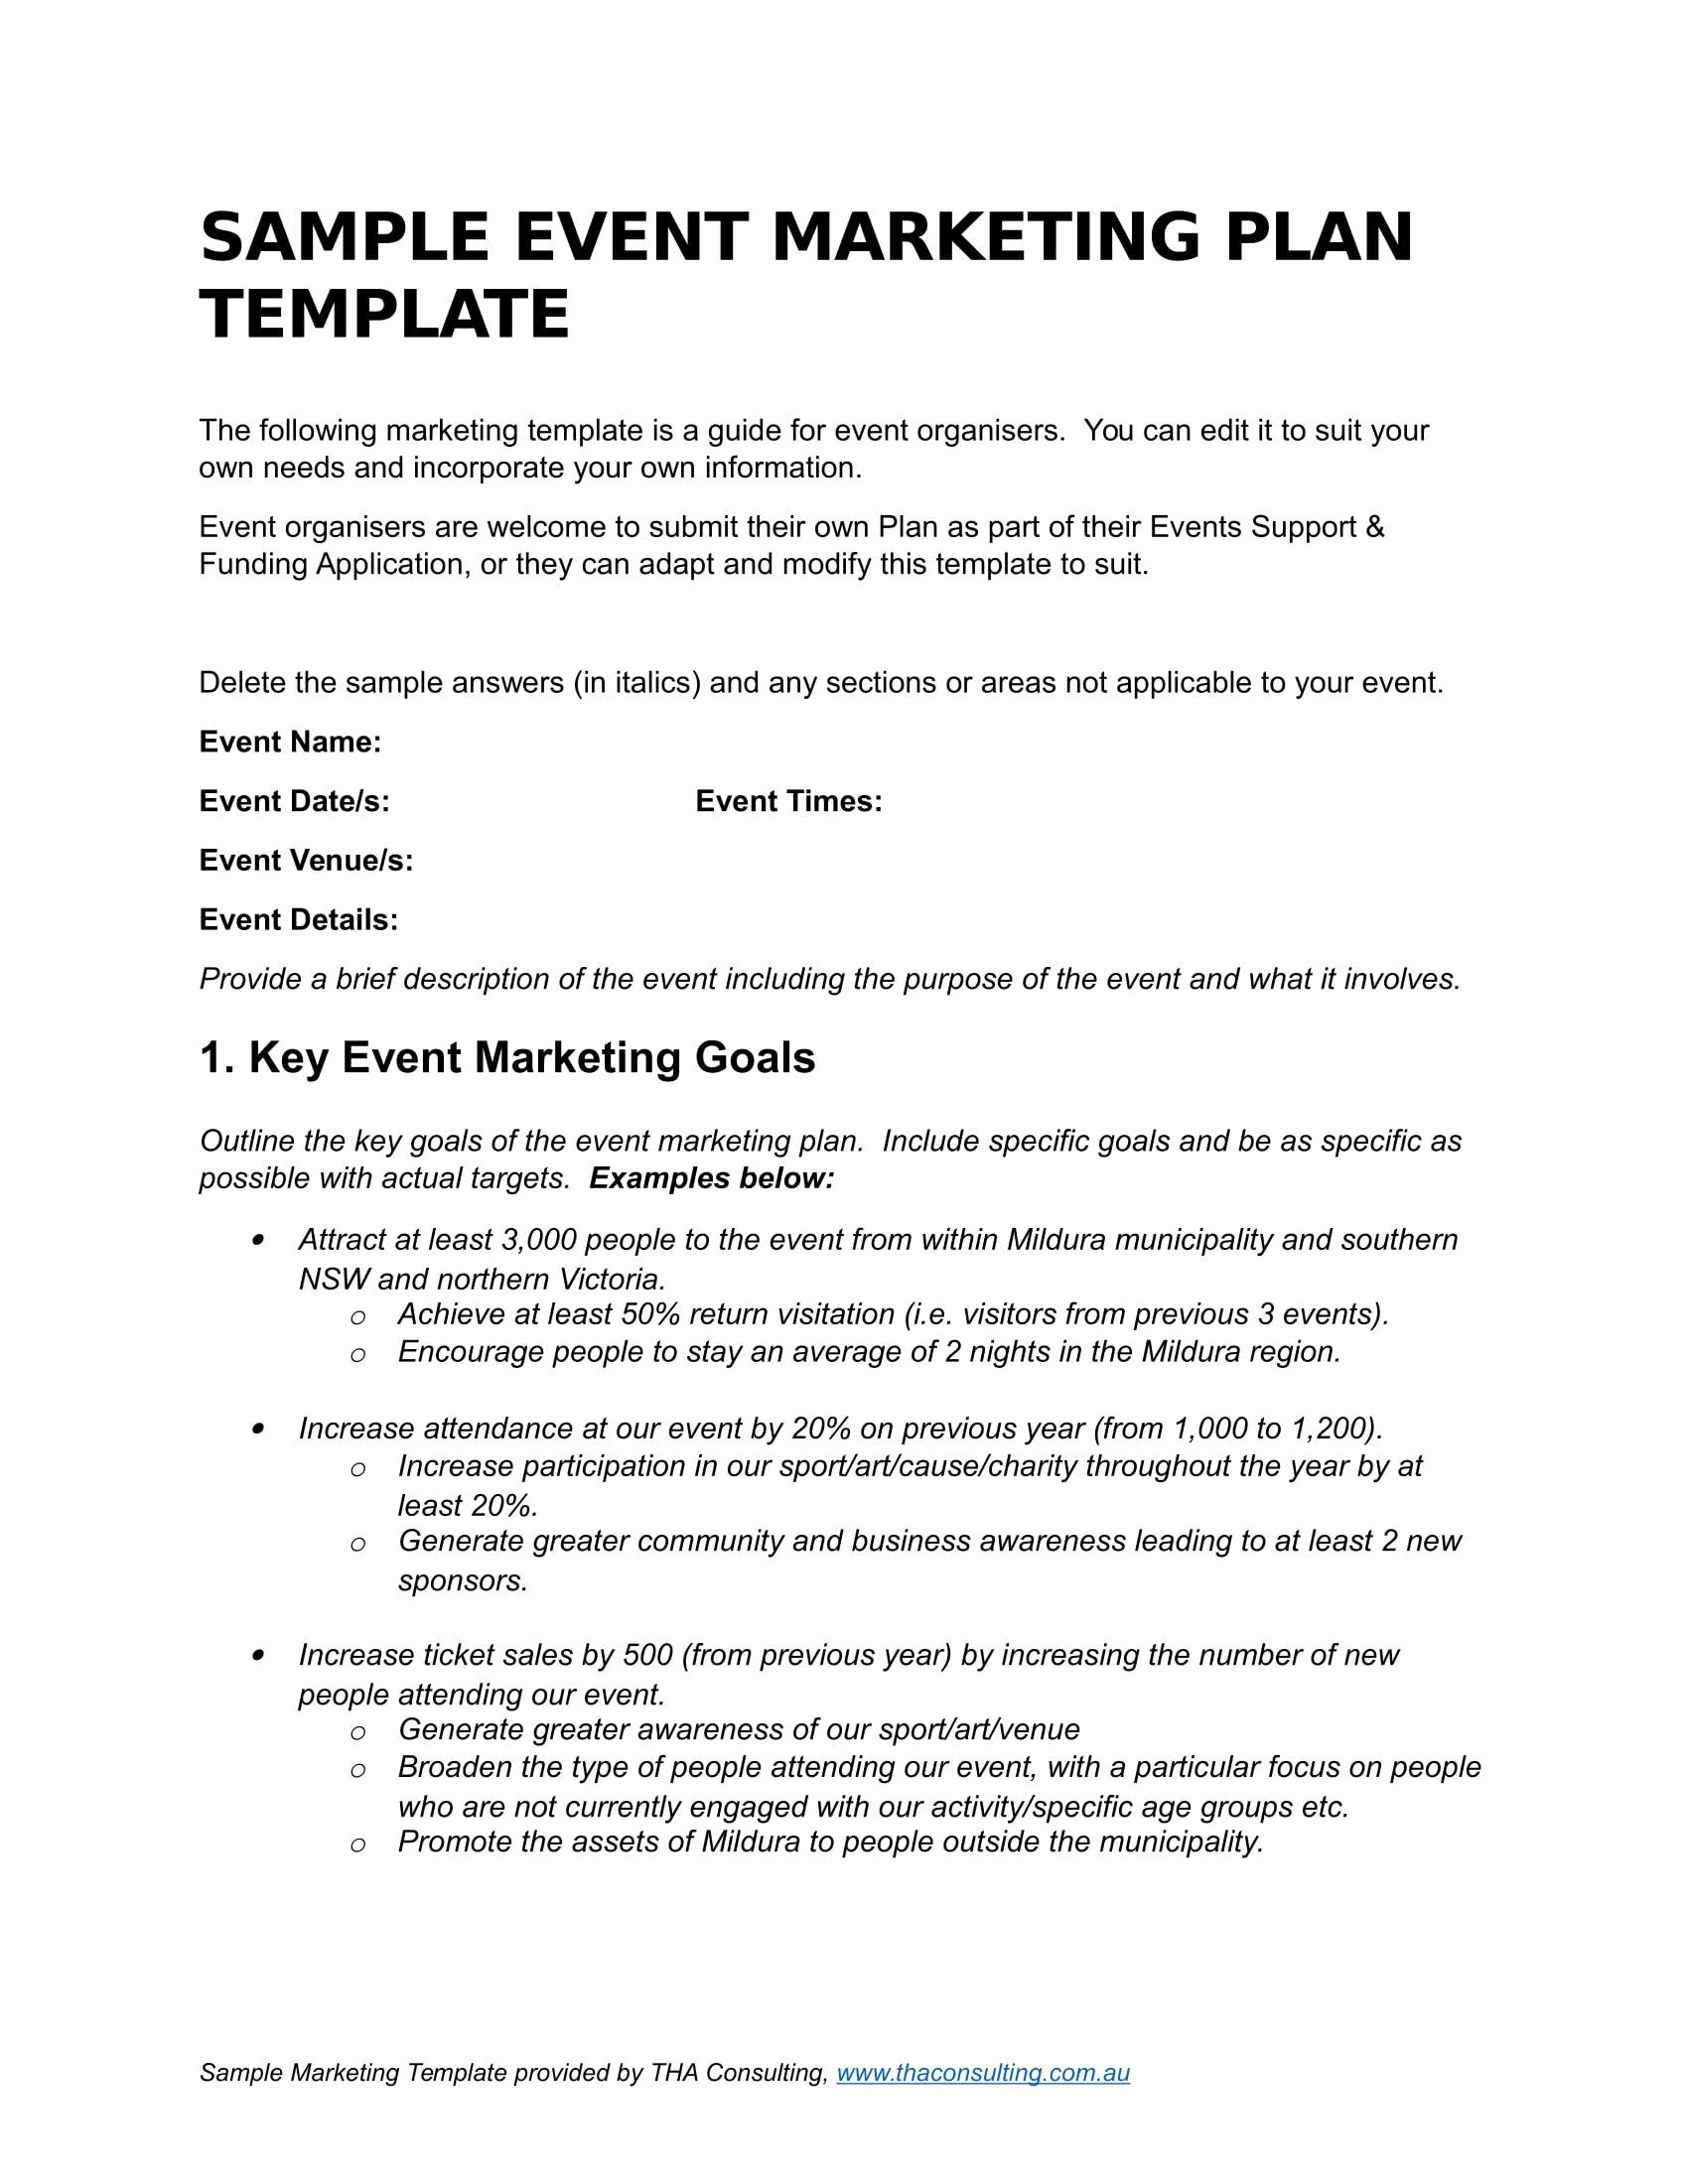 Marketing Plan Outline Template Elegant How to Create An event Marketing Plan Gevme Blog